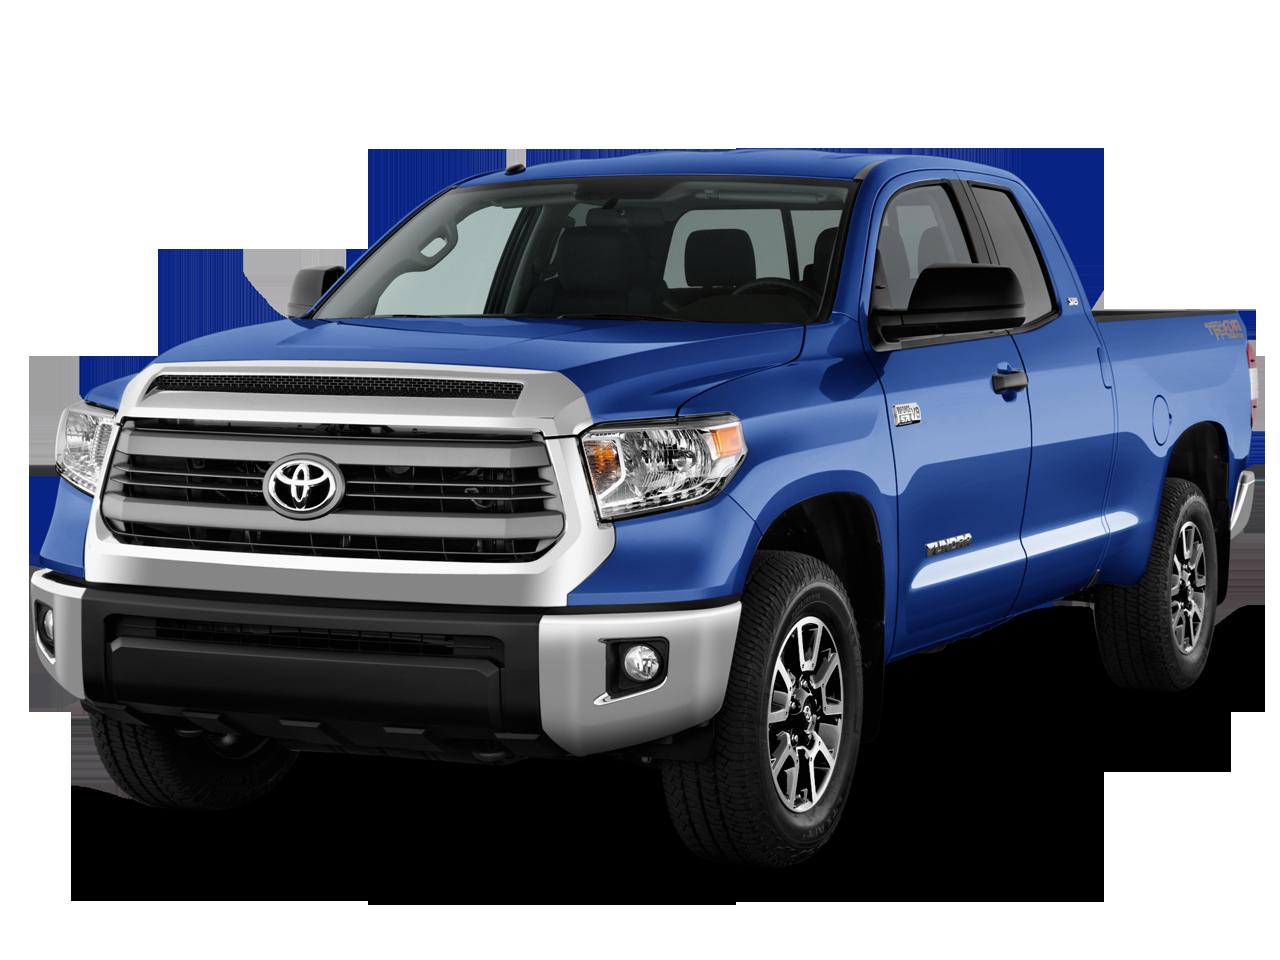 Toyota Of Tri Cities Kennewick Wa >> New 2017 Toyota Tundra SR5 4D Double Cab - Near Kennewick WA - Toyota of Tri-Cities